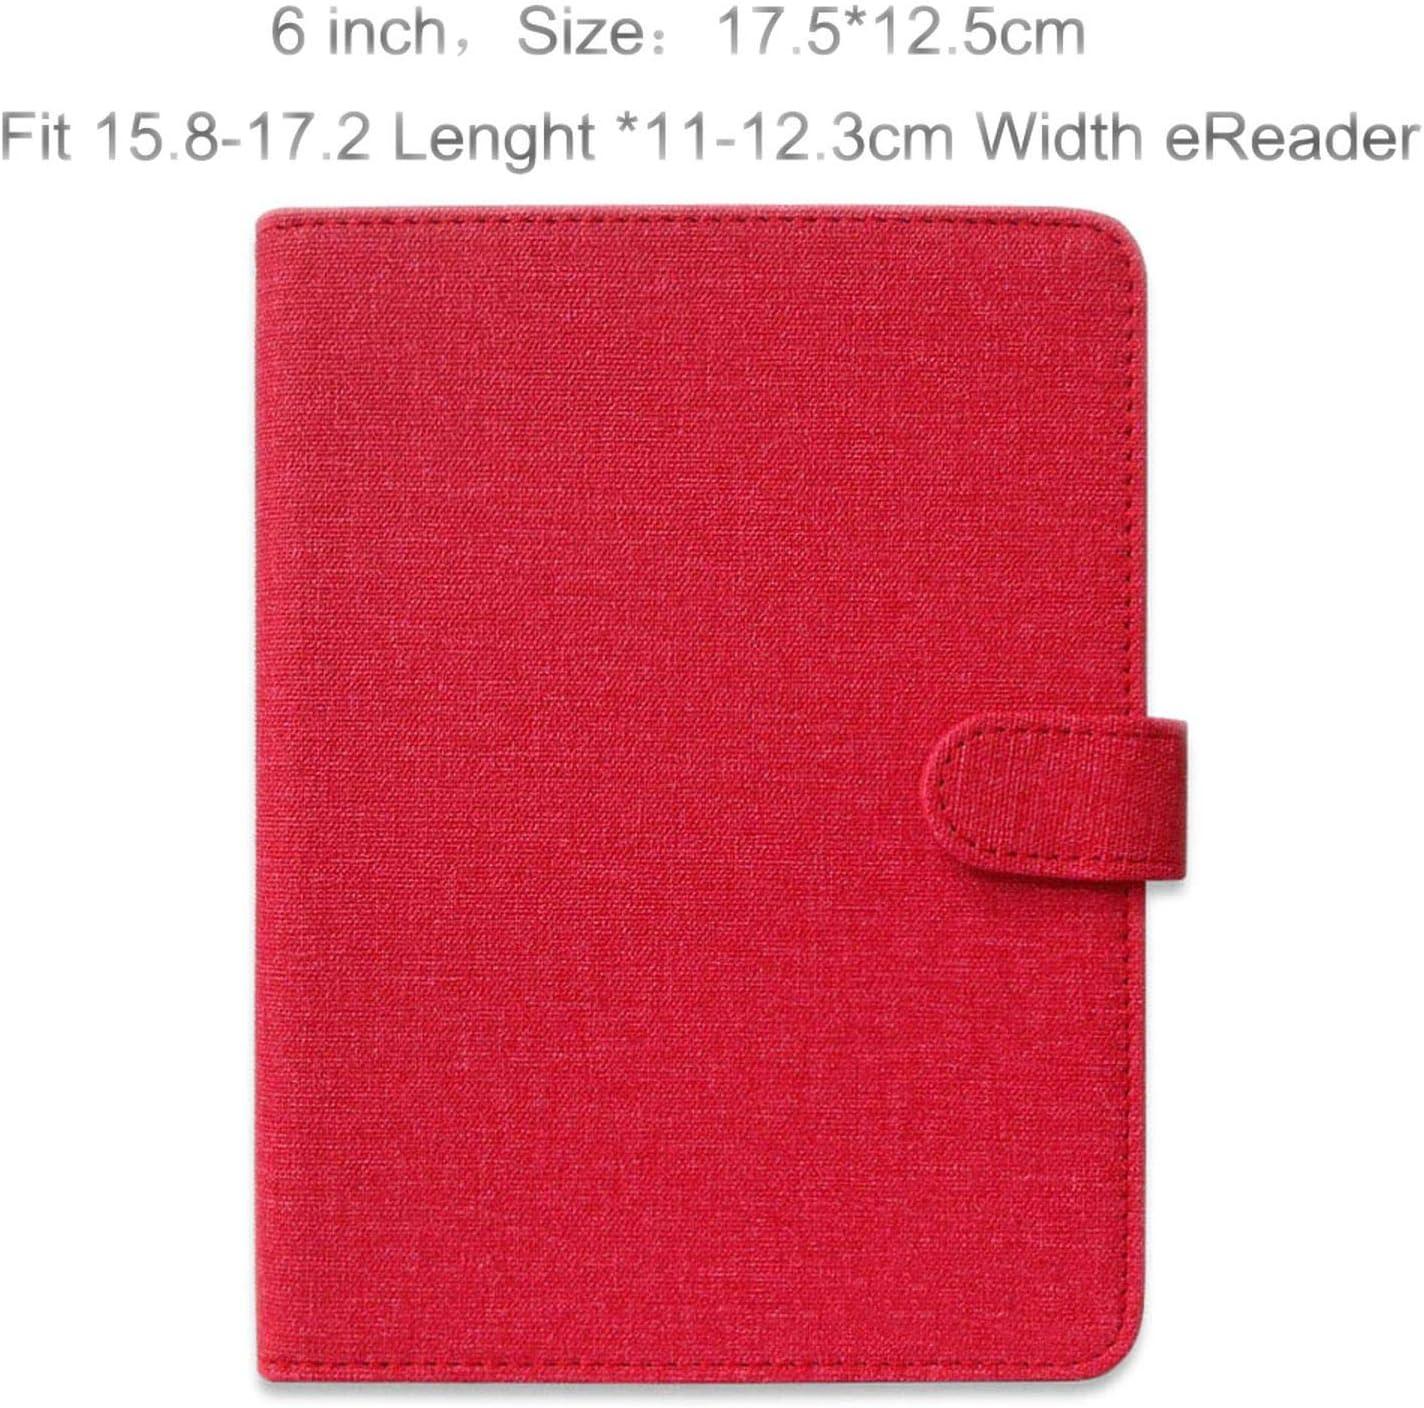 6 6.8 7.8 Pulgadas Ereader Funda para E Book Cover para Onyx Pocketbook Digma para Kindle Paperwhite Protective Skin: Amazon.es: Electrónica